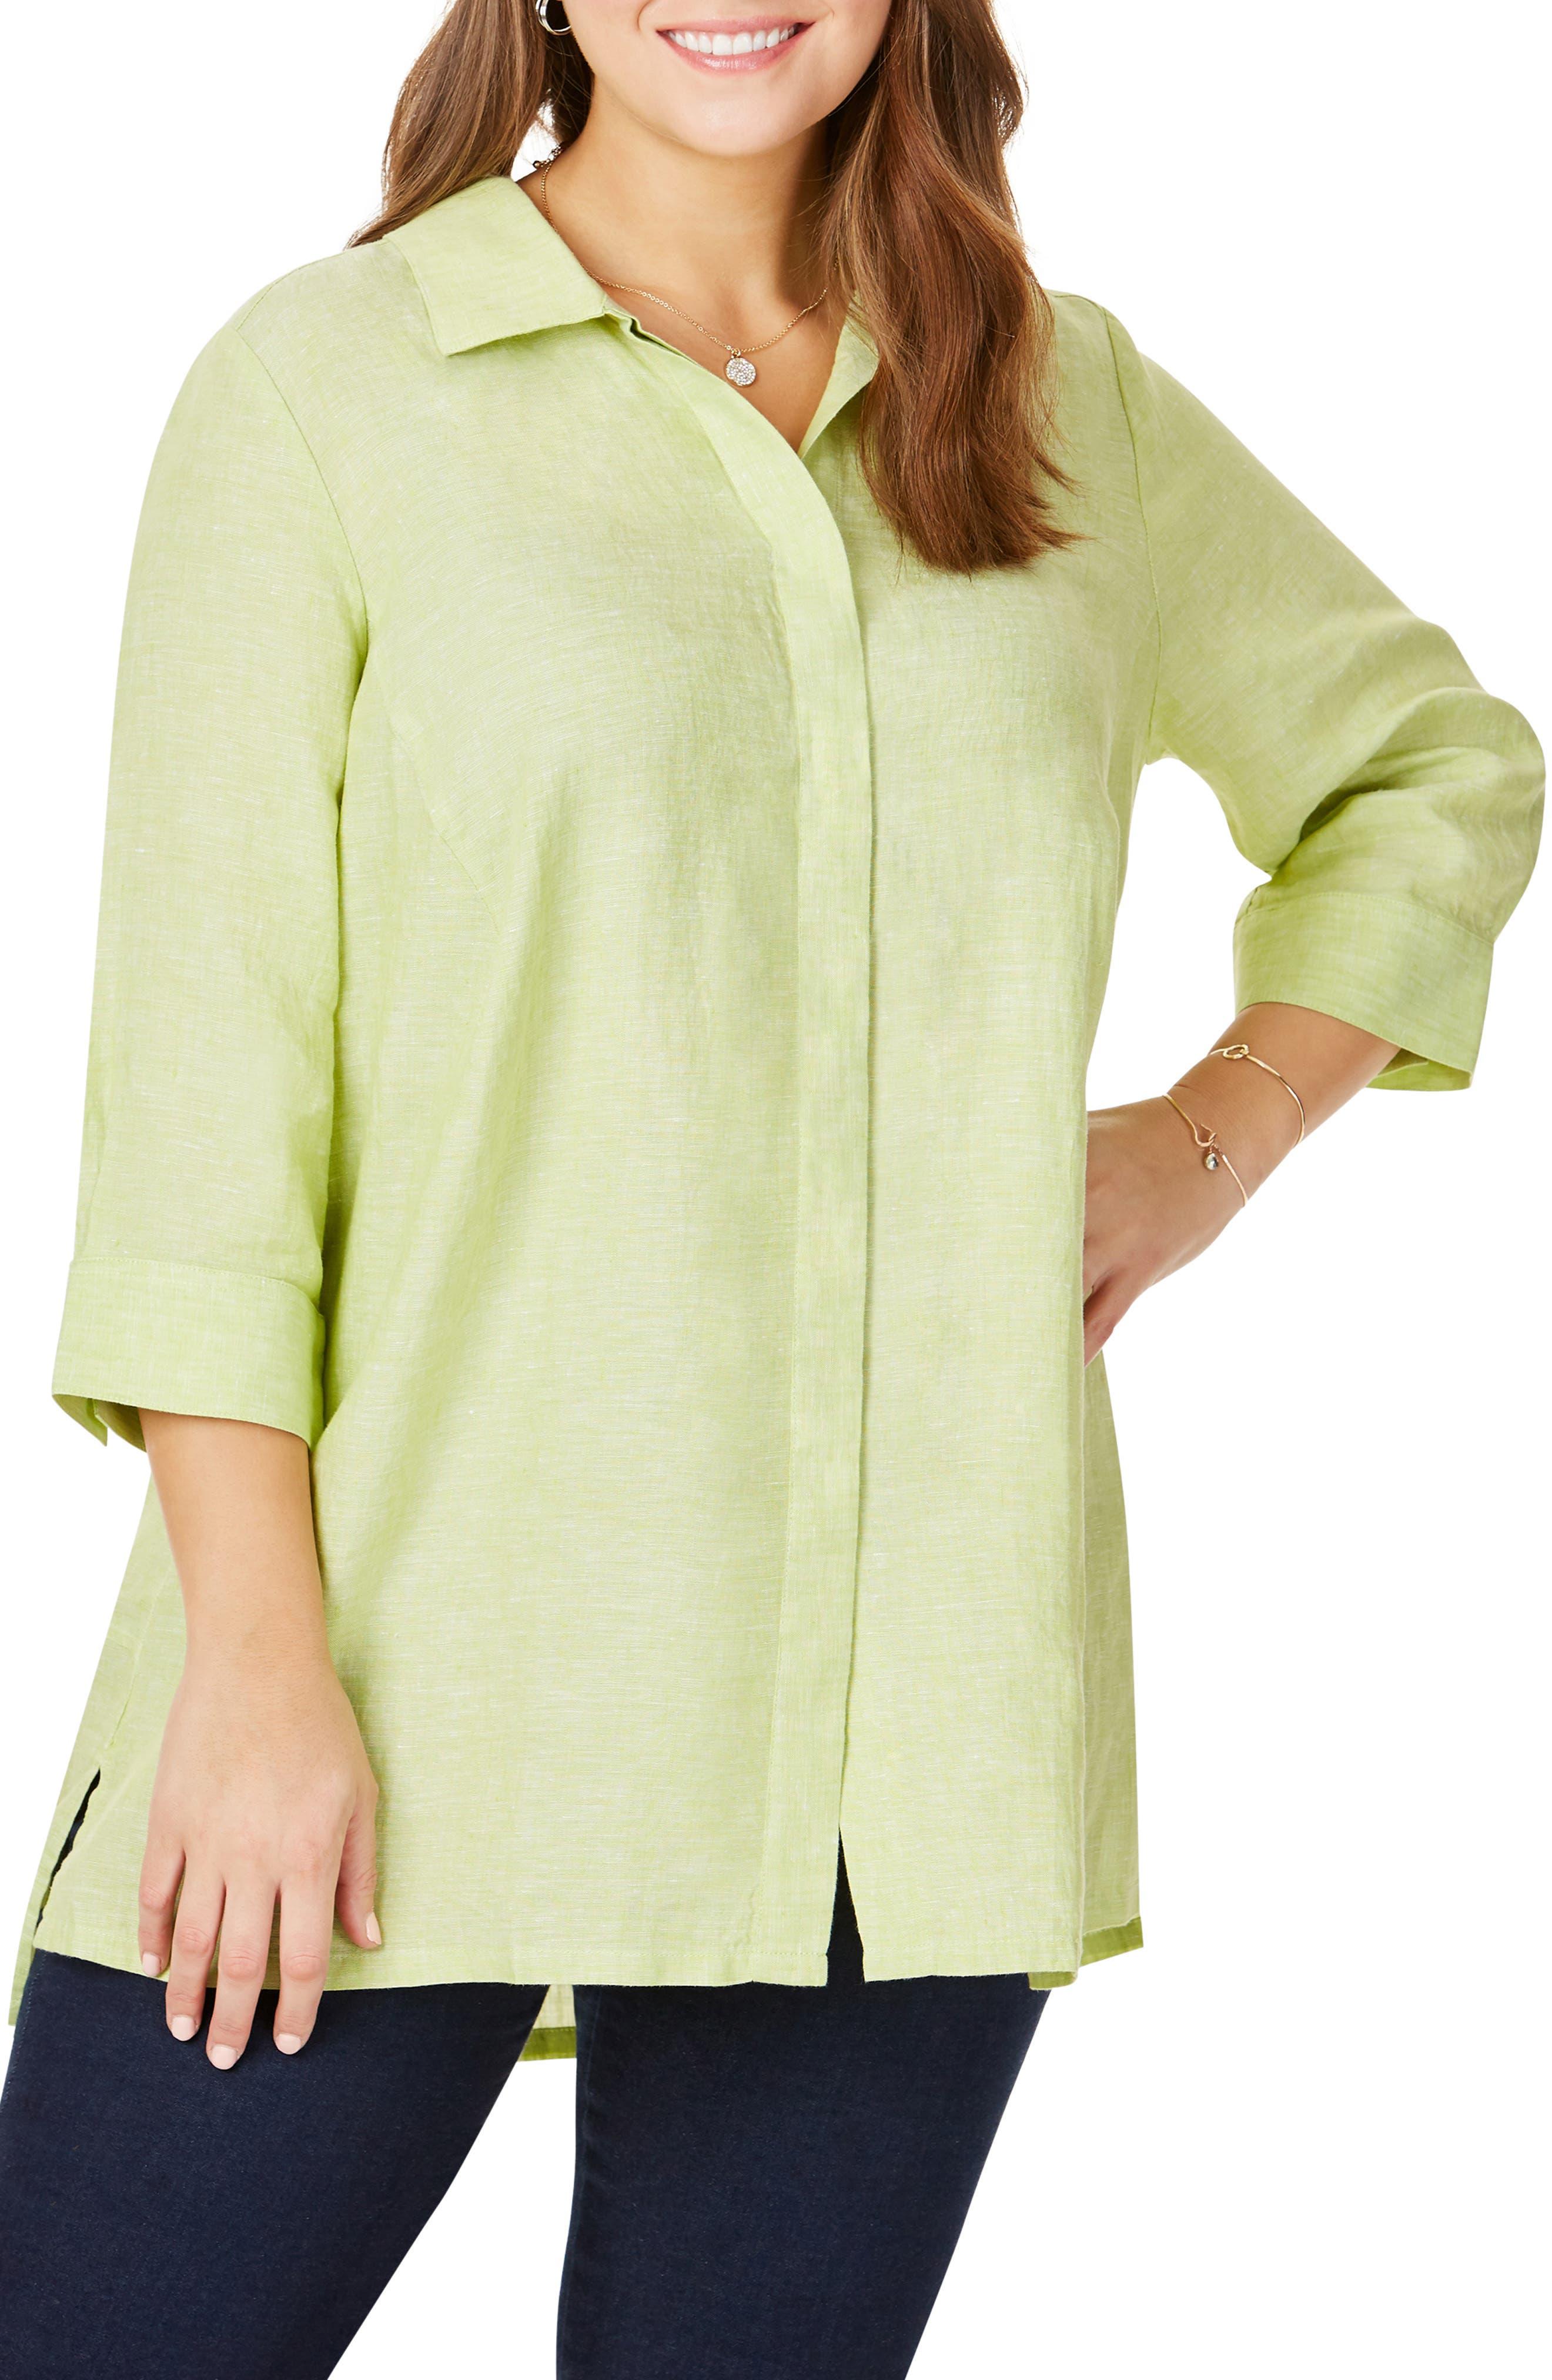 FOXCROFT Chambray Linen Tunic Shirt, Main, color, MARGARITA